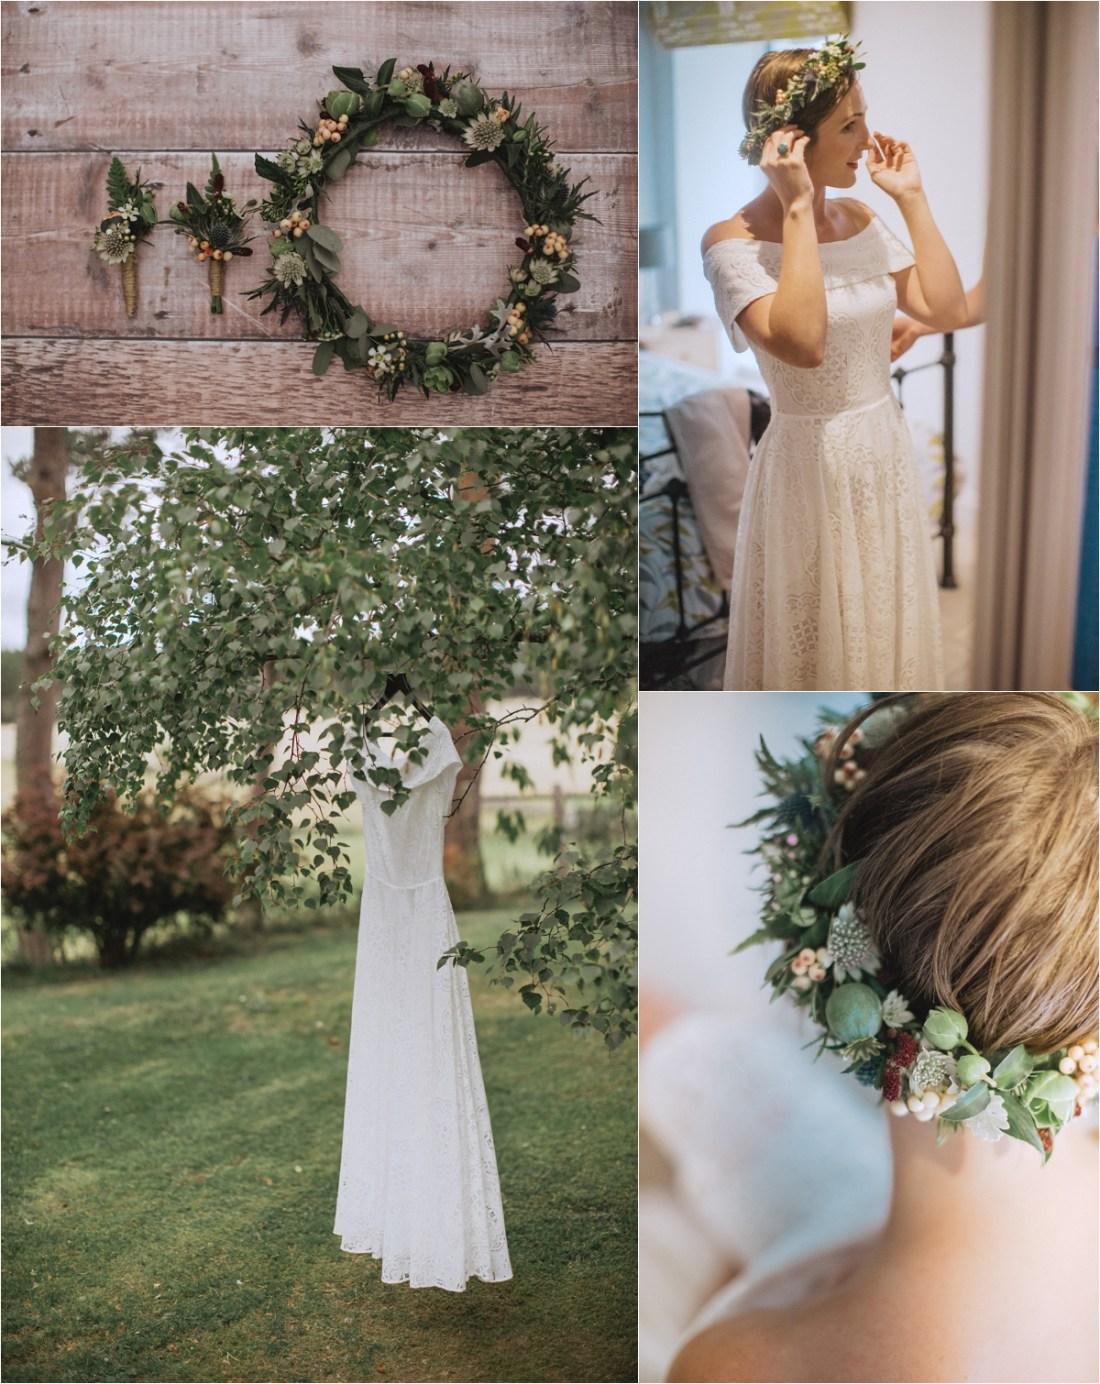 Bohemian bridal details for a DIY sheep farm wedding by Fox & Bear Photography